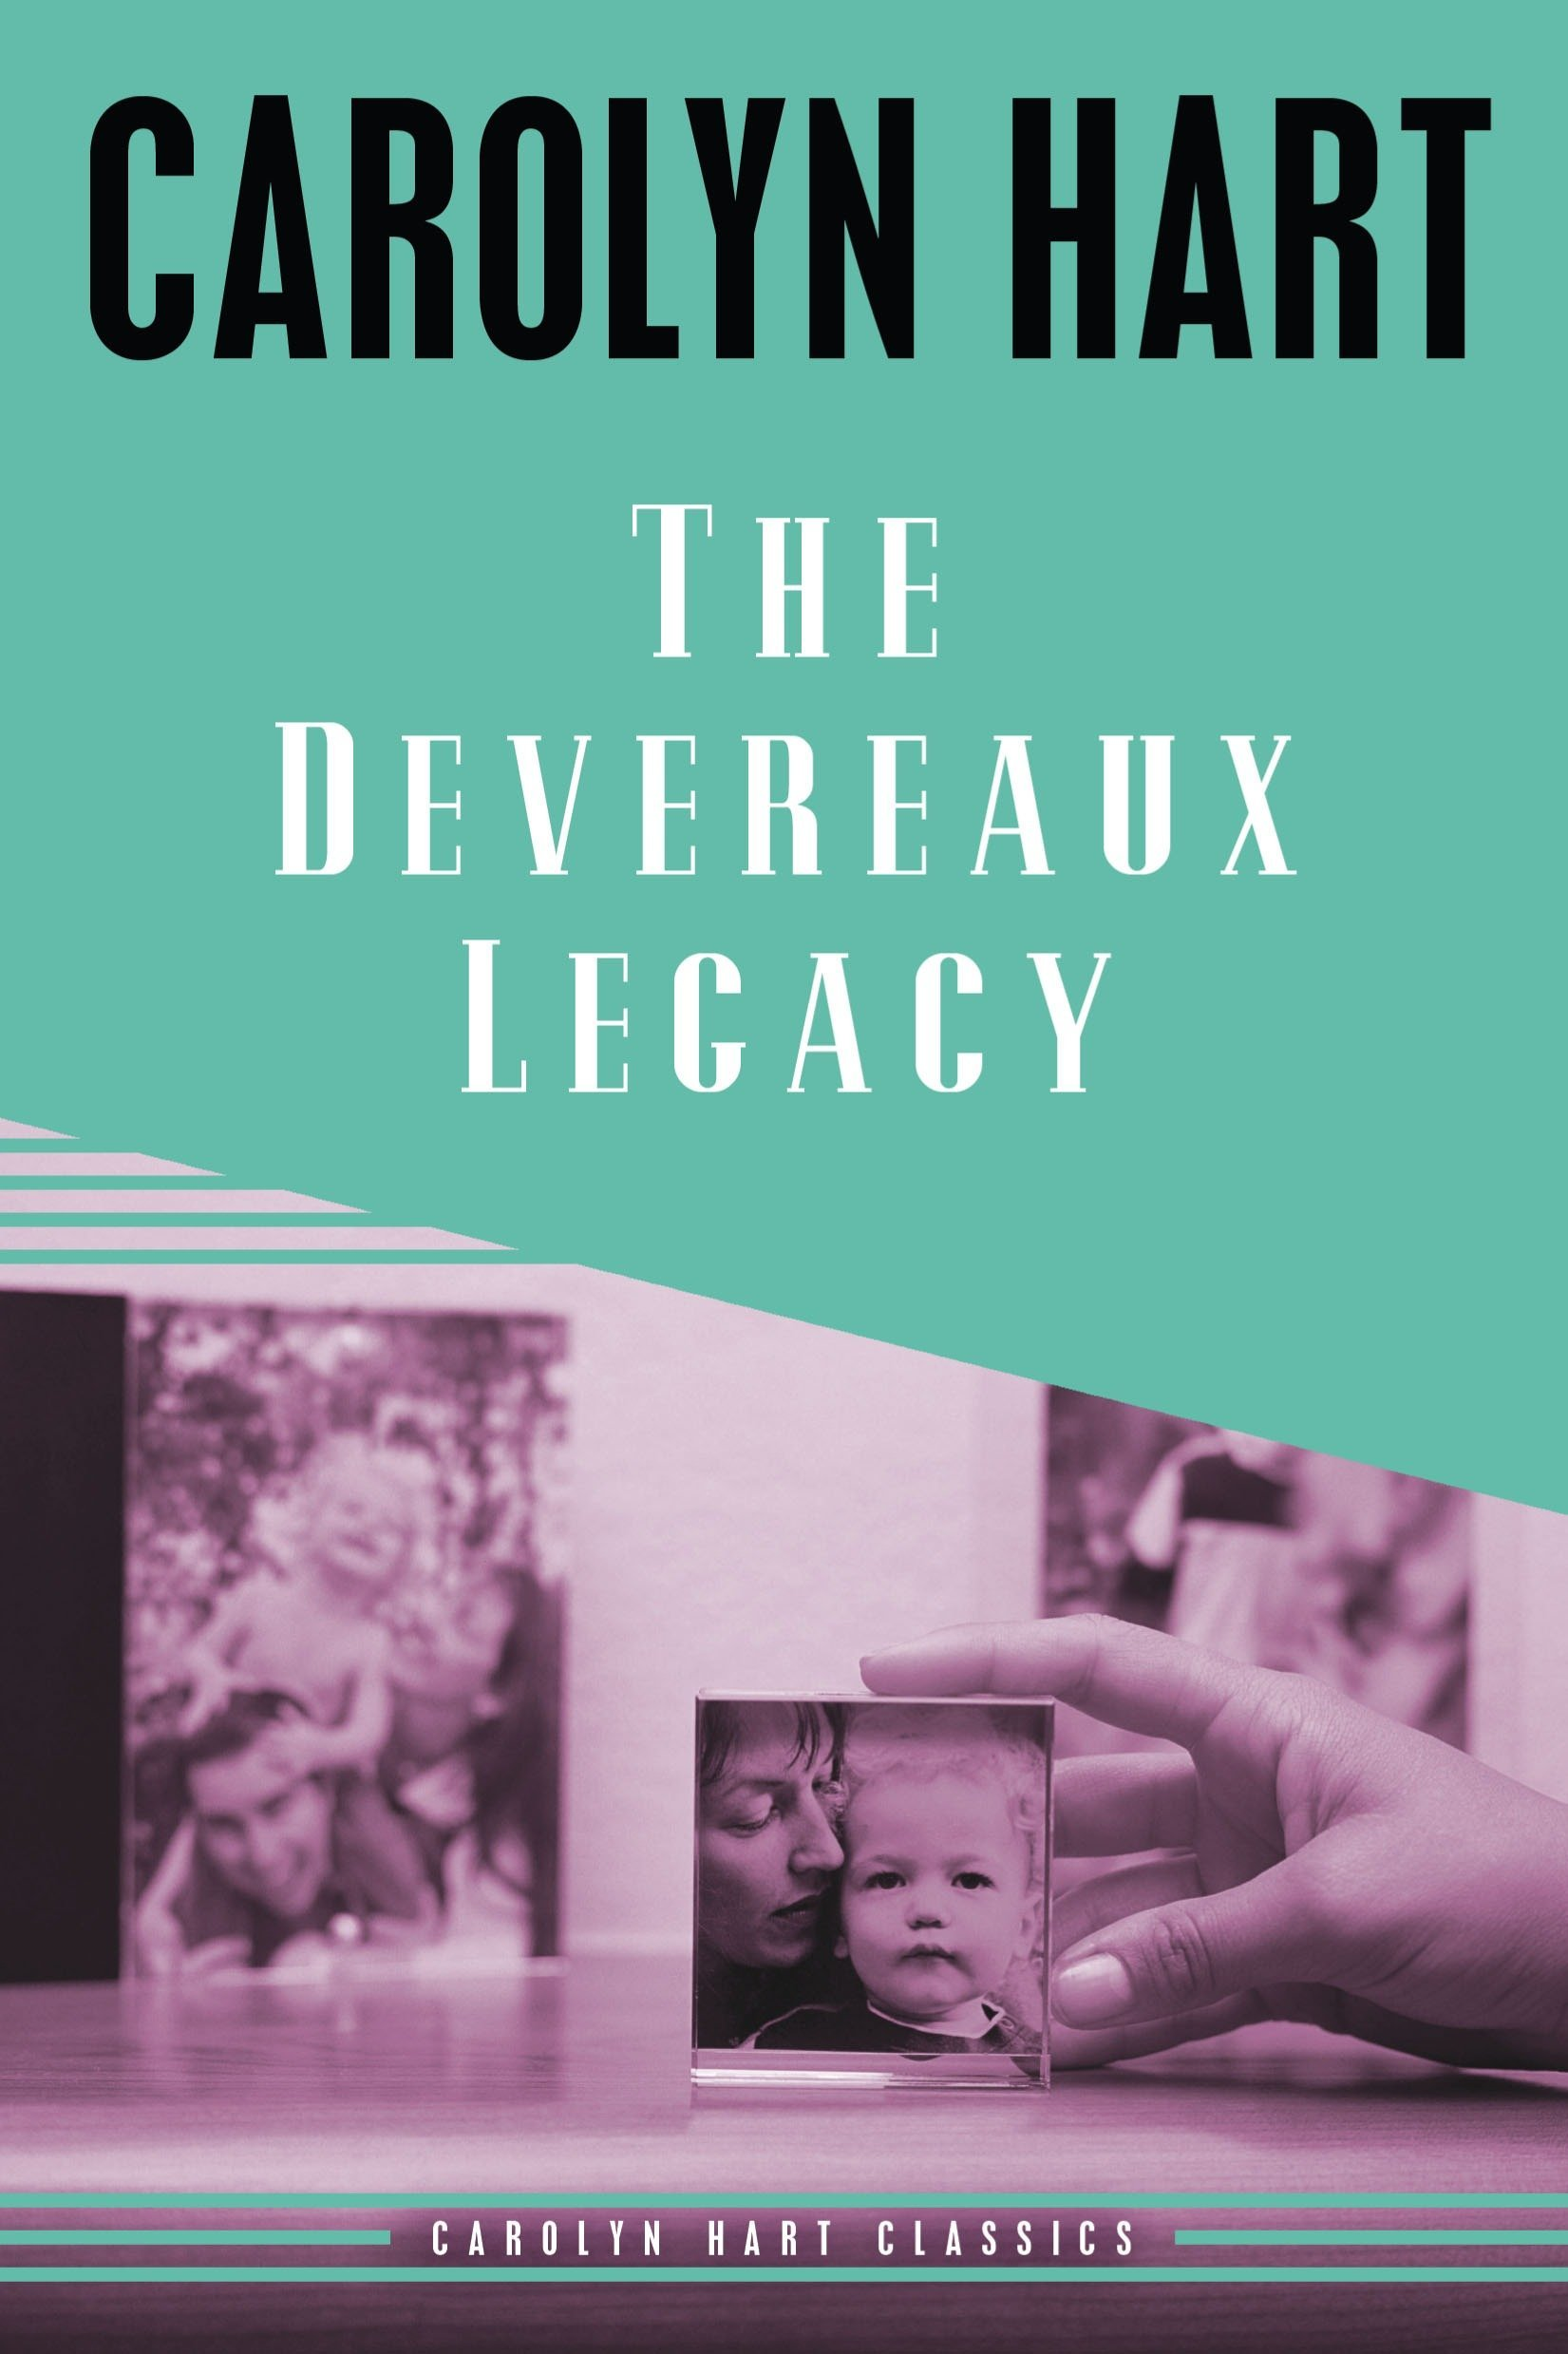 The Devereaux Legacy (Carolyn Hart Classics) pdf